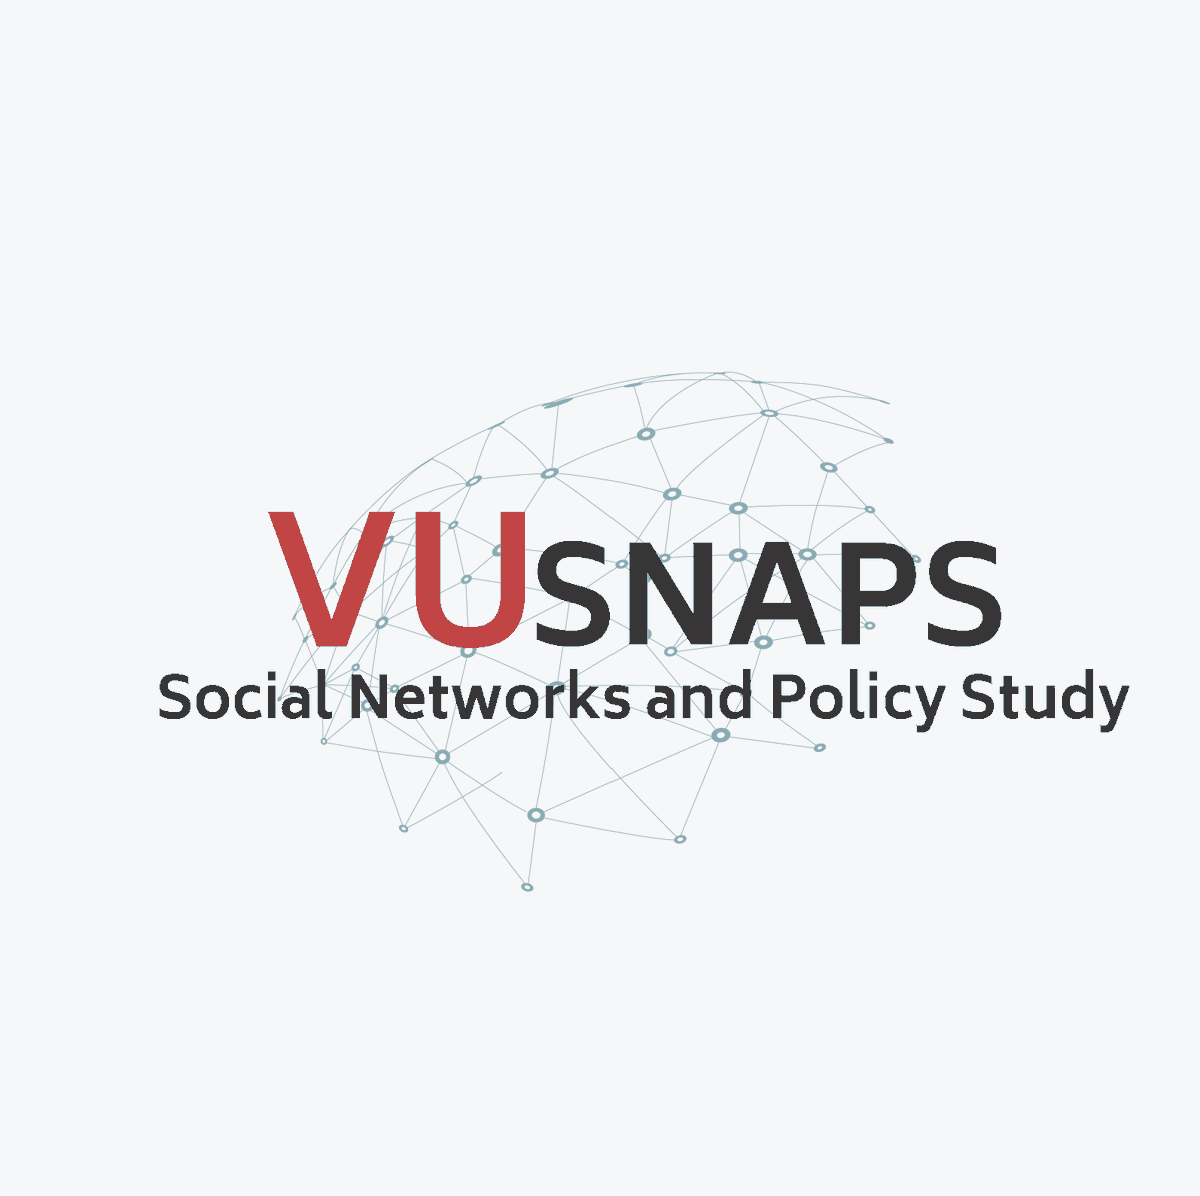 vusnaps hashtag on Twitter